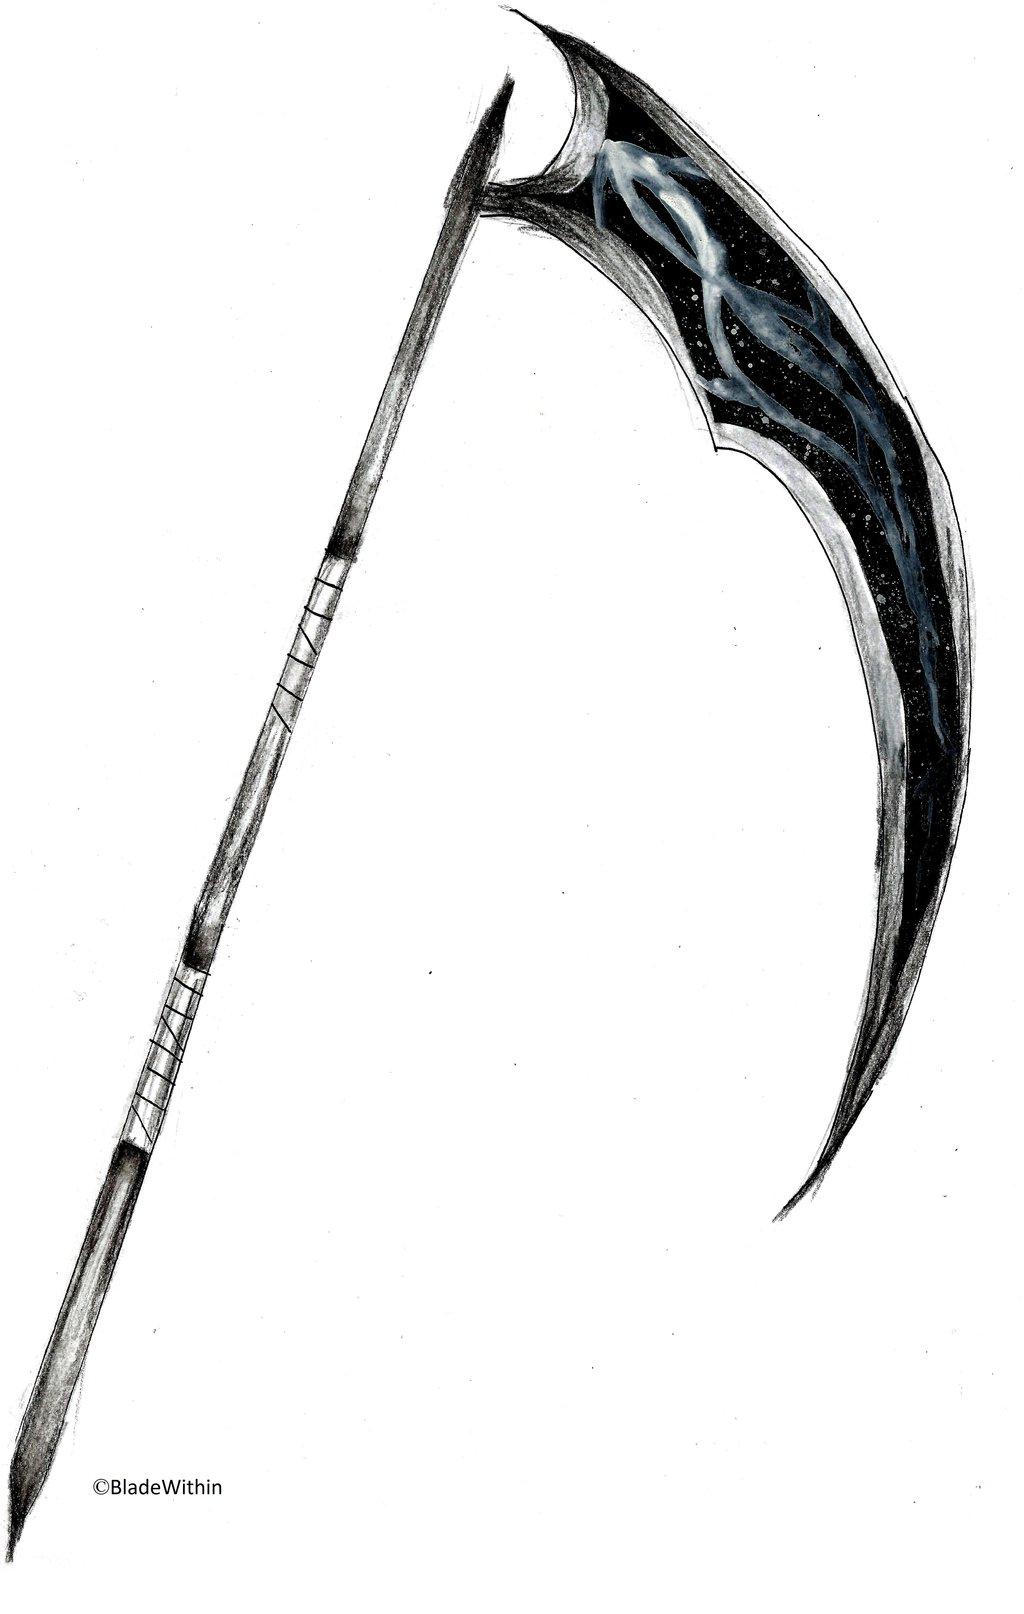 Drawn scythe darkness Weapon MonoChrome Scythe MonoChrome Scythe